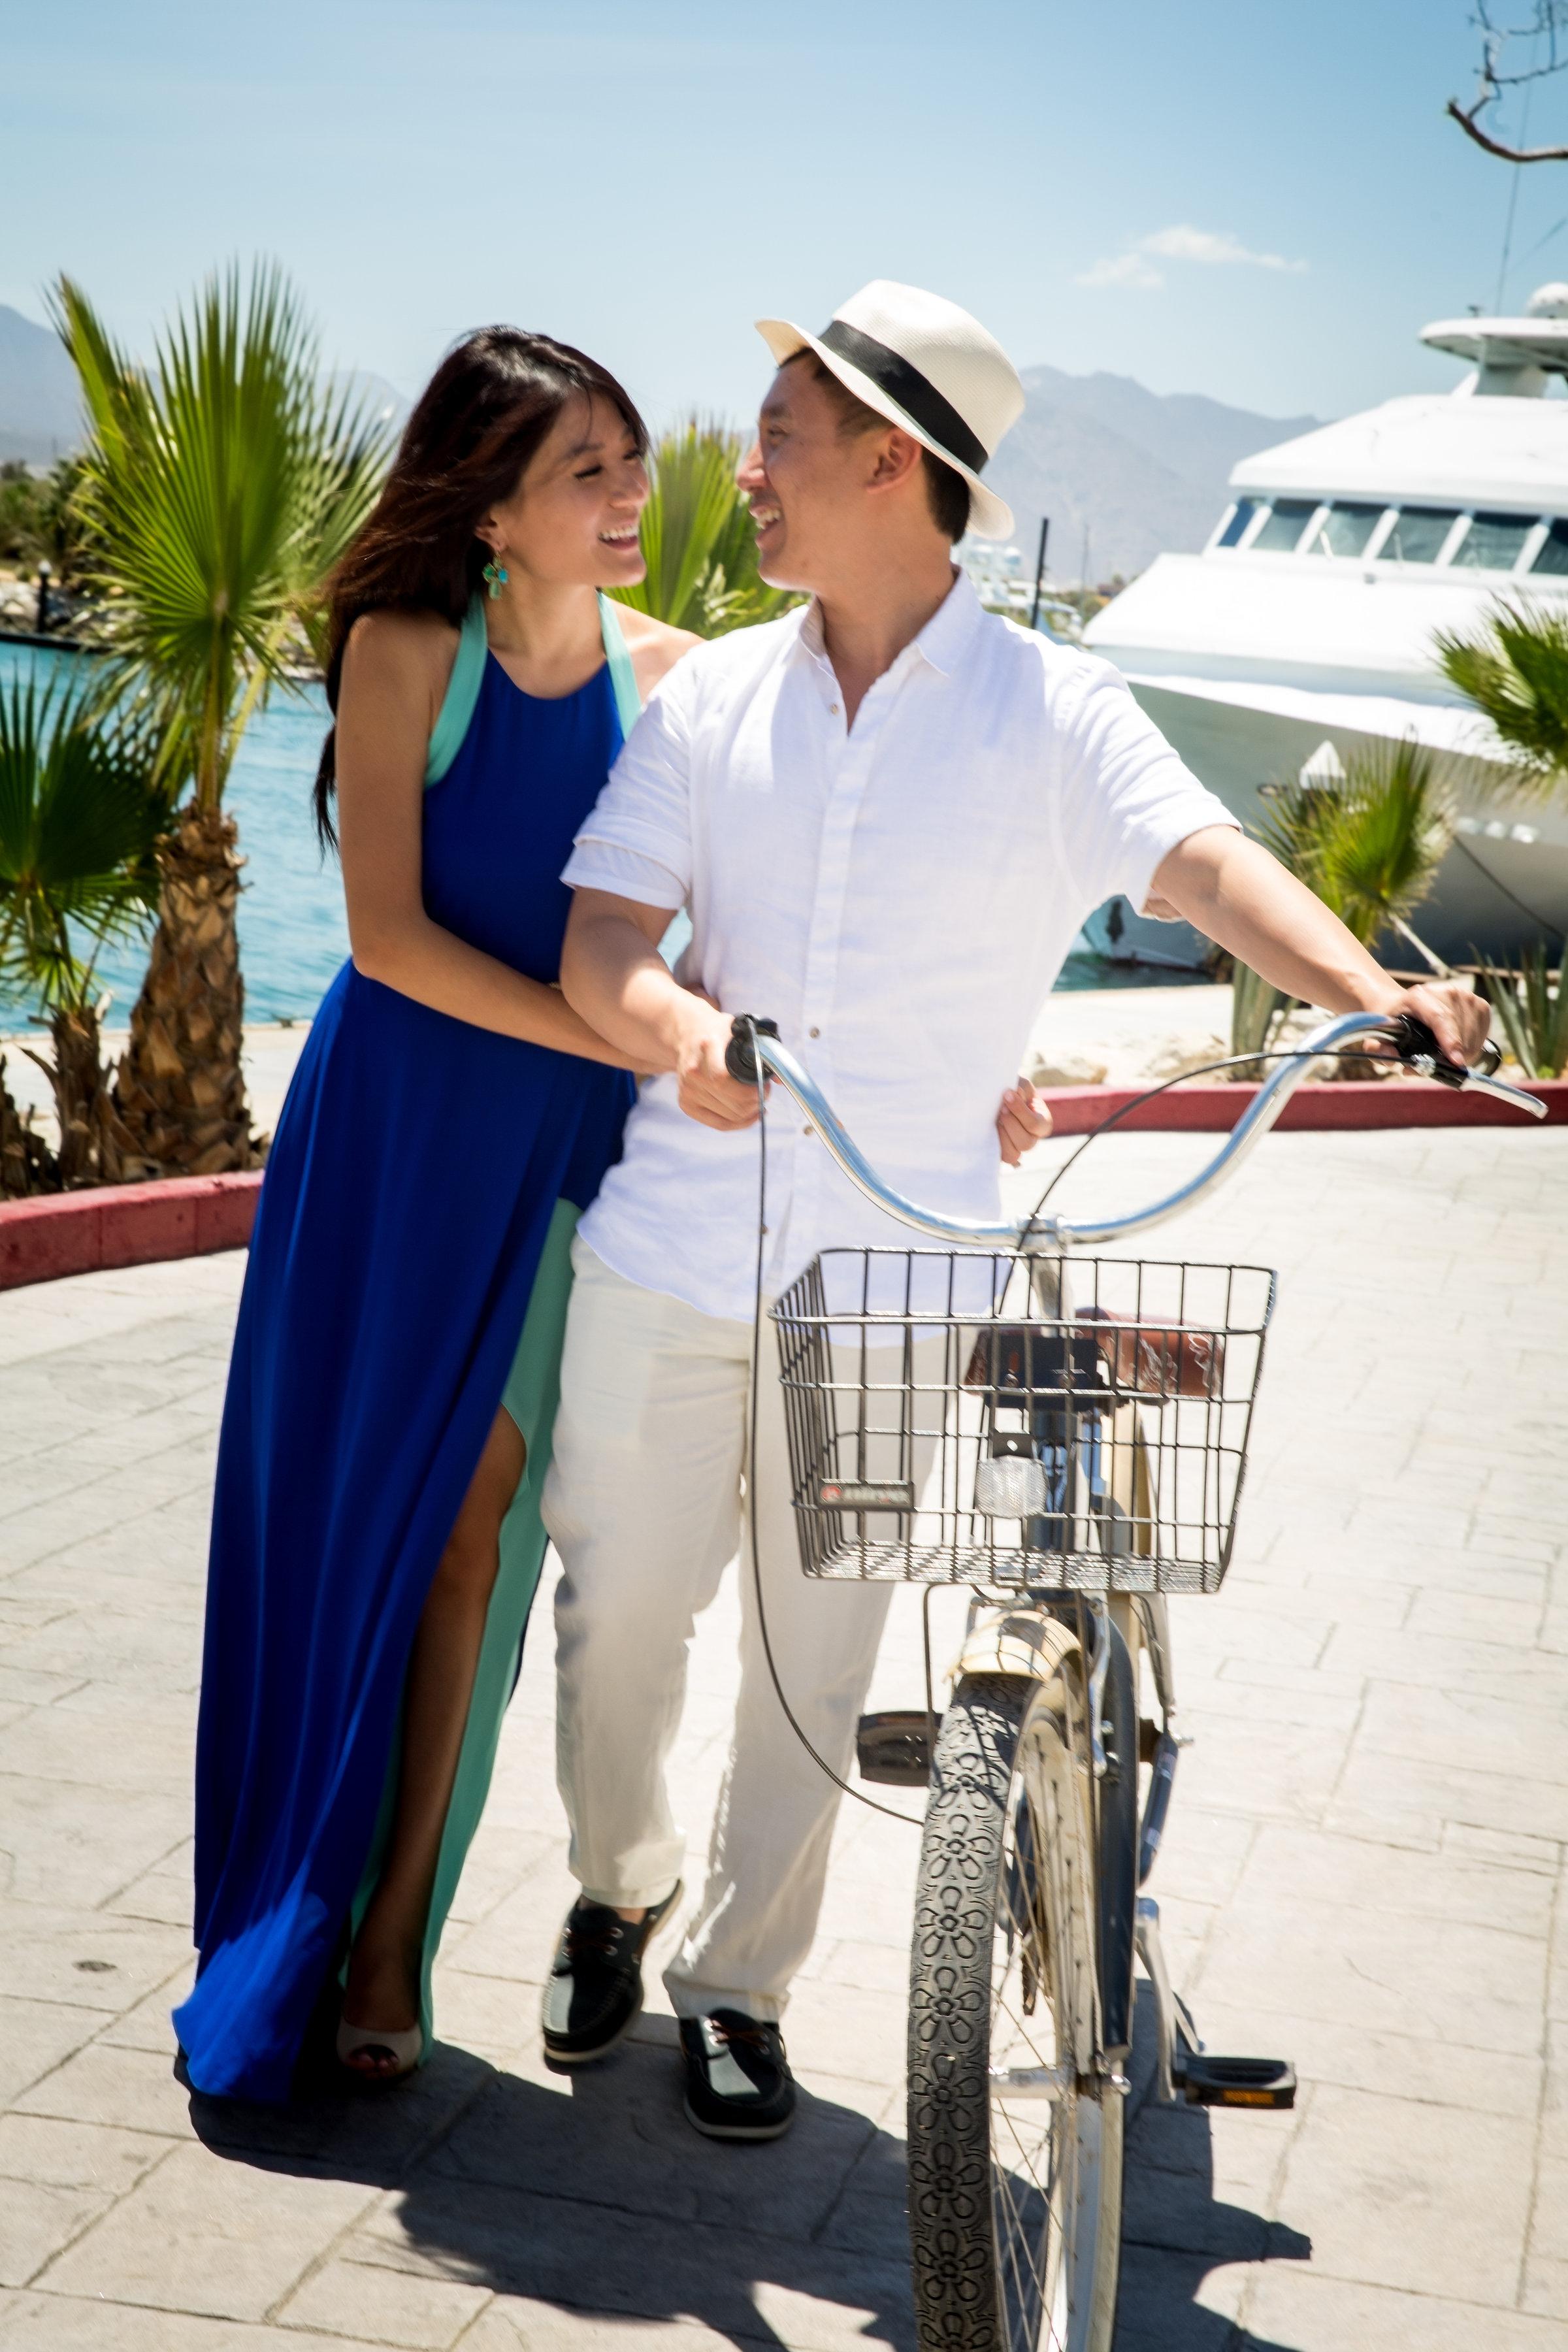 cabo-destination-wedding-mexico-4eyesphotogapyy (6).jpg